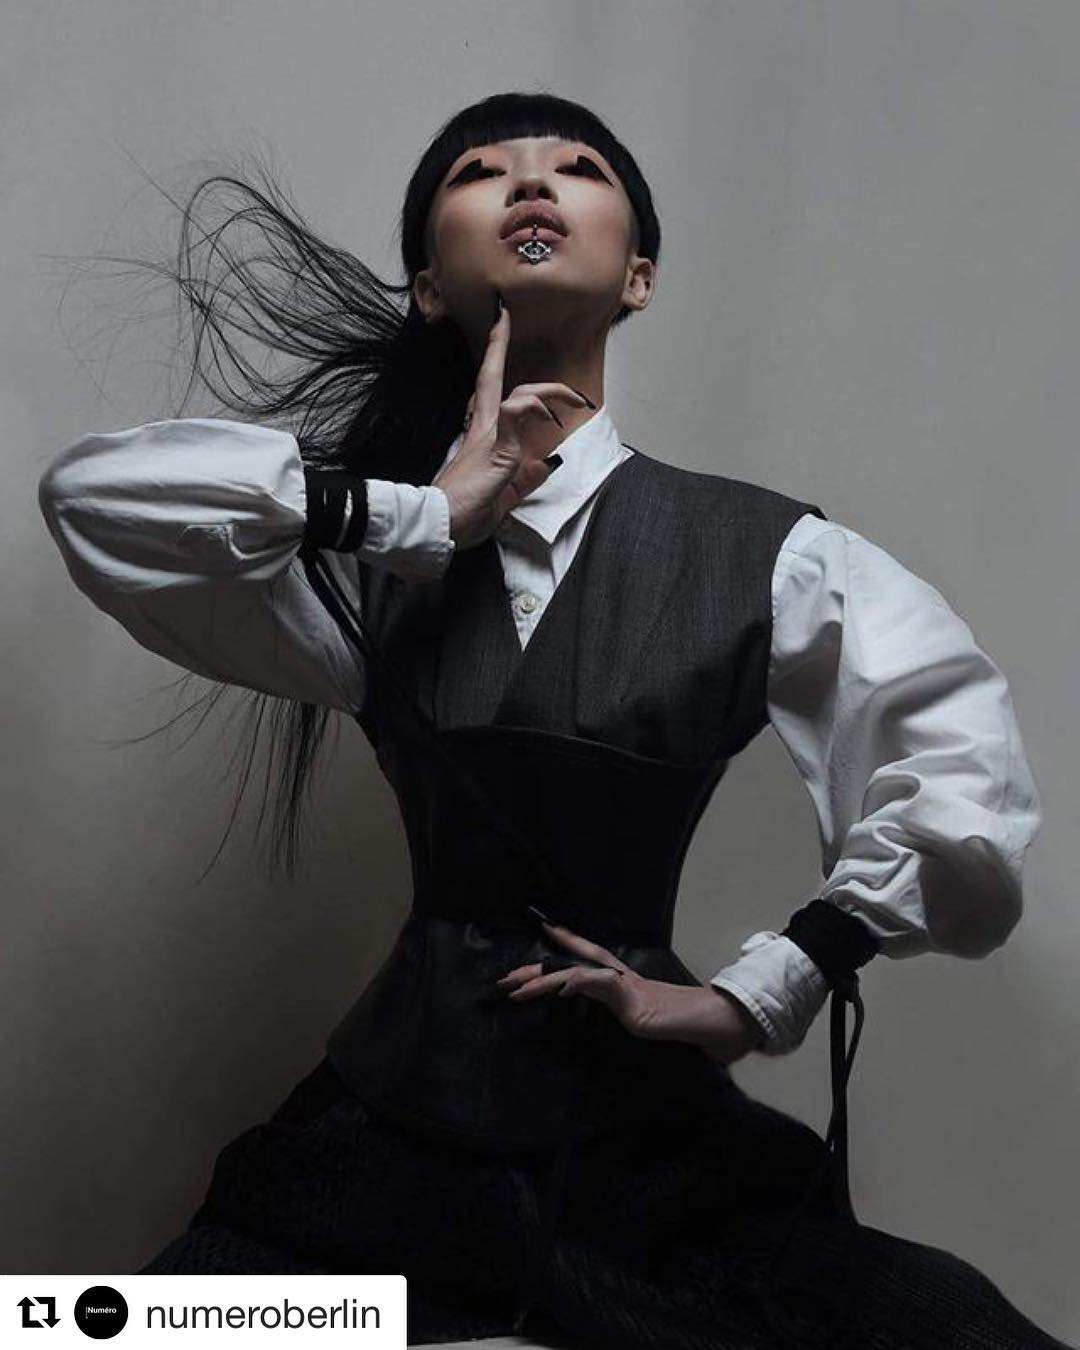 nữ daner-Aya Sato mặc trang phục menwear